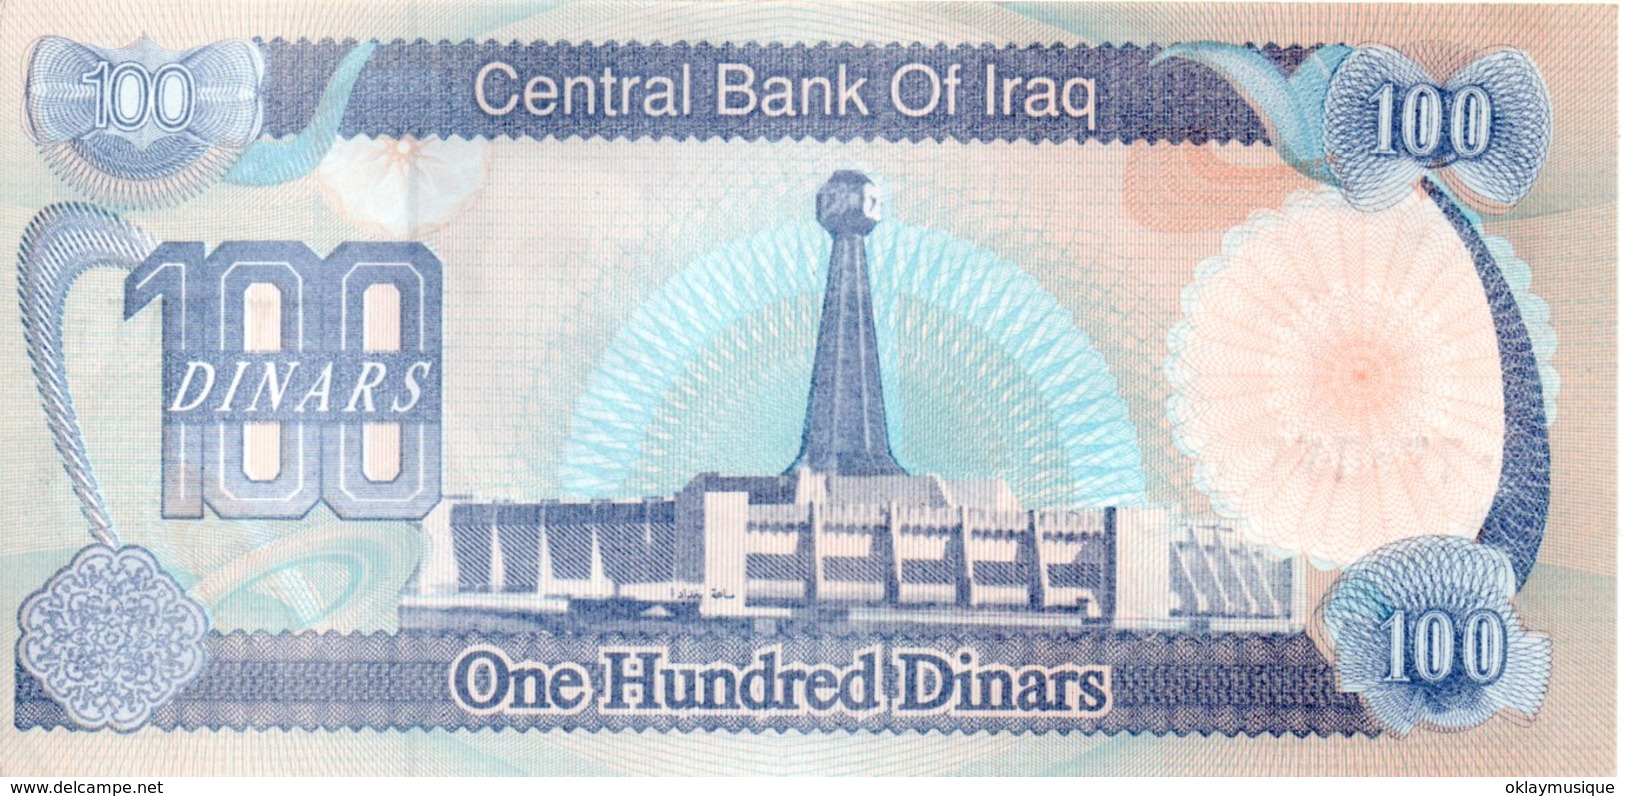 100 Dinars 1994 Neuf - Iraq